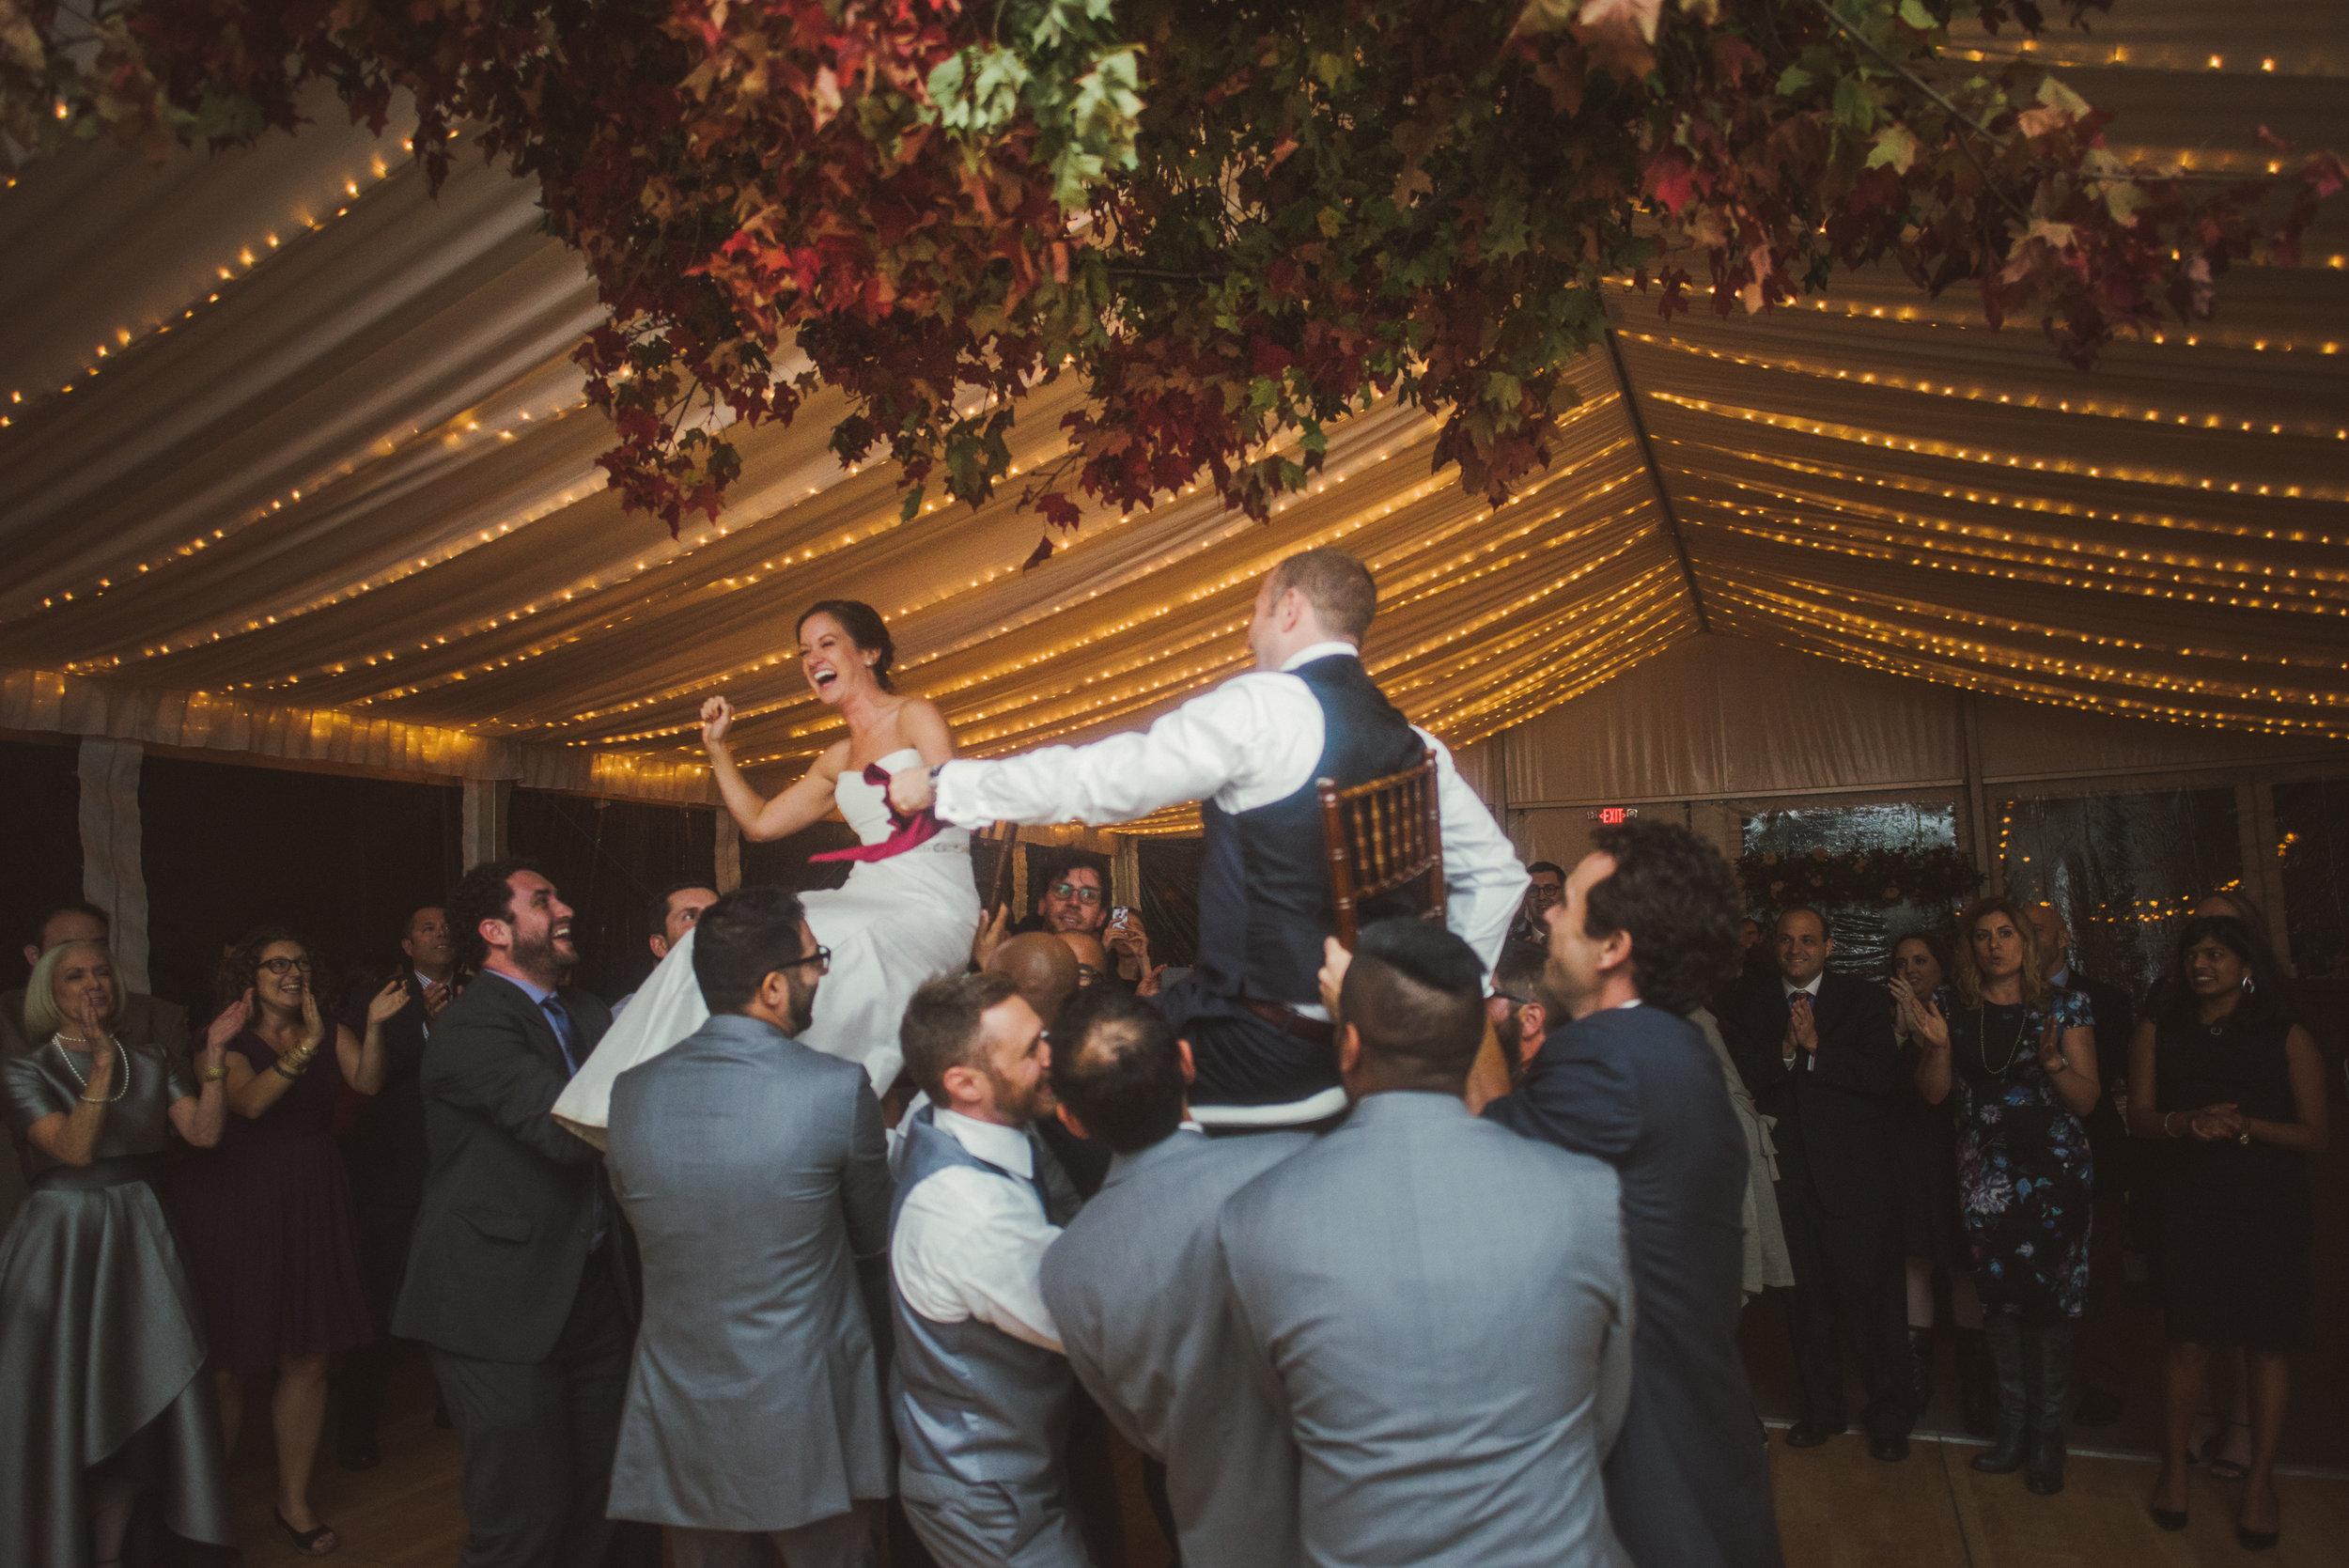 JACQUELINE & ANDREW WARSHAWER -BROOKMILL FARM FALL WEDDING - INTIMATE WEDDING PHOTOGRAPHER - TWOTWENTY by CHI-CHI AGBIM-670.jpg